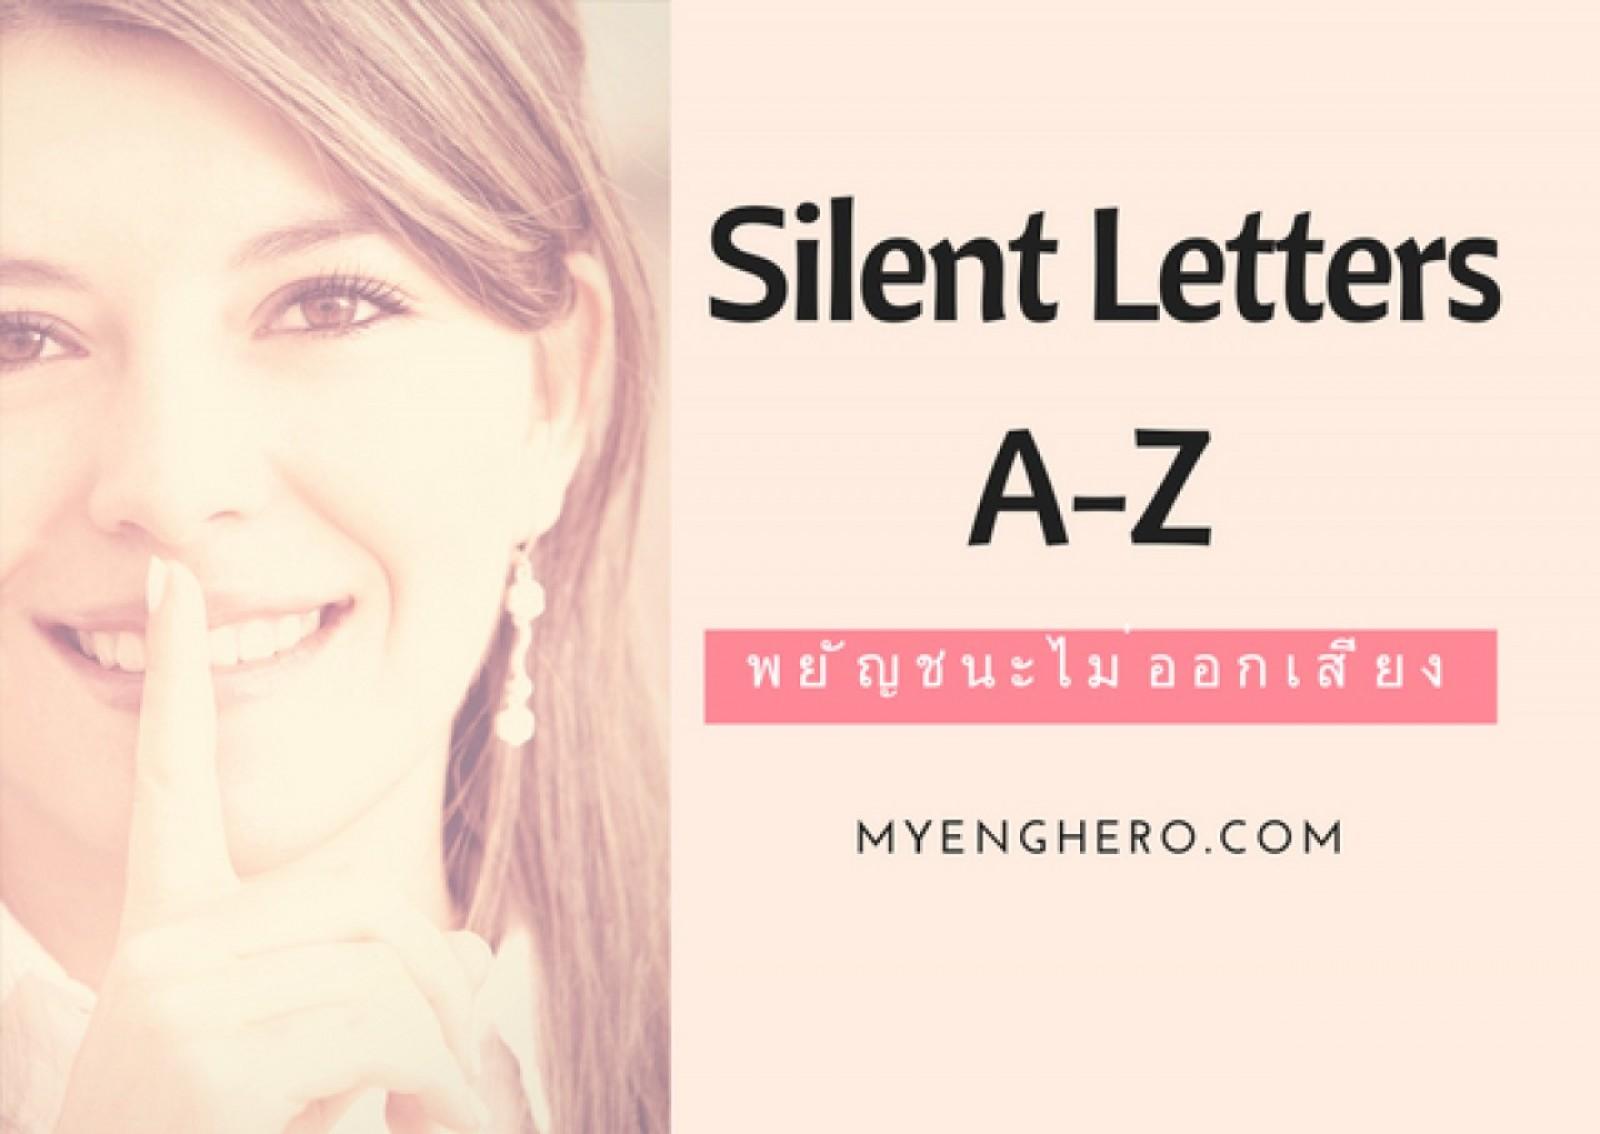 Silent Letters A-Z (พยัญชนะไม่ออกเสียง A-Z)